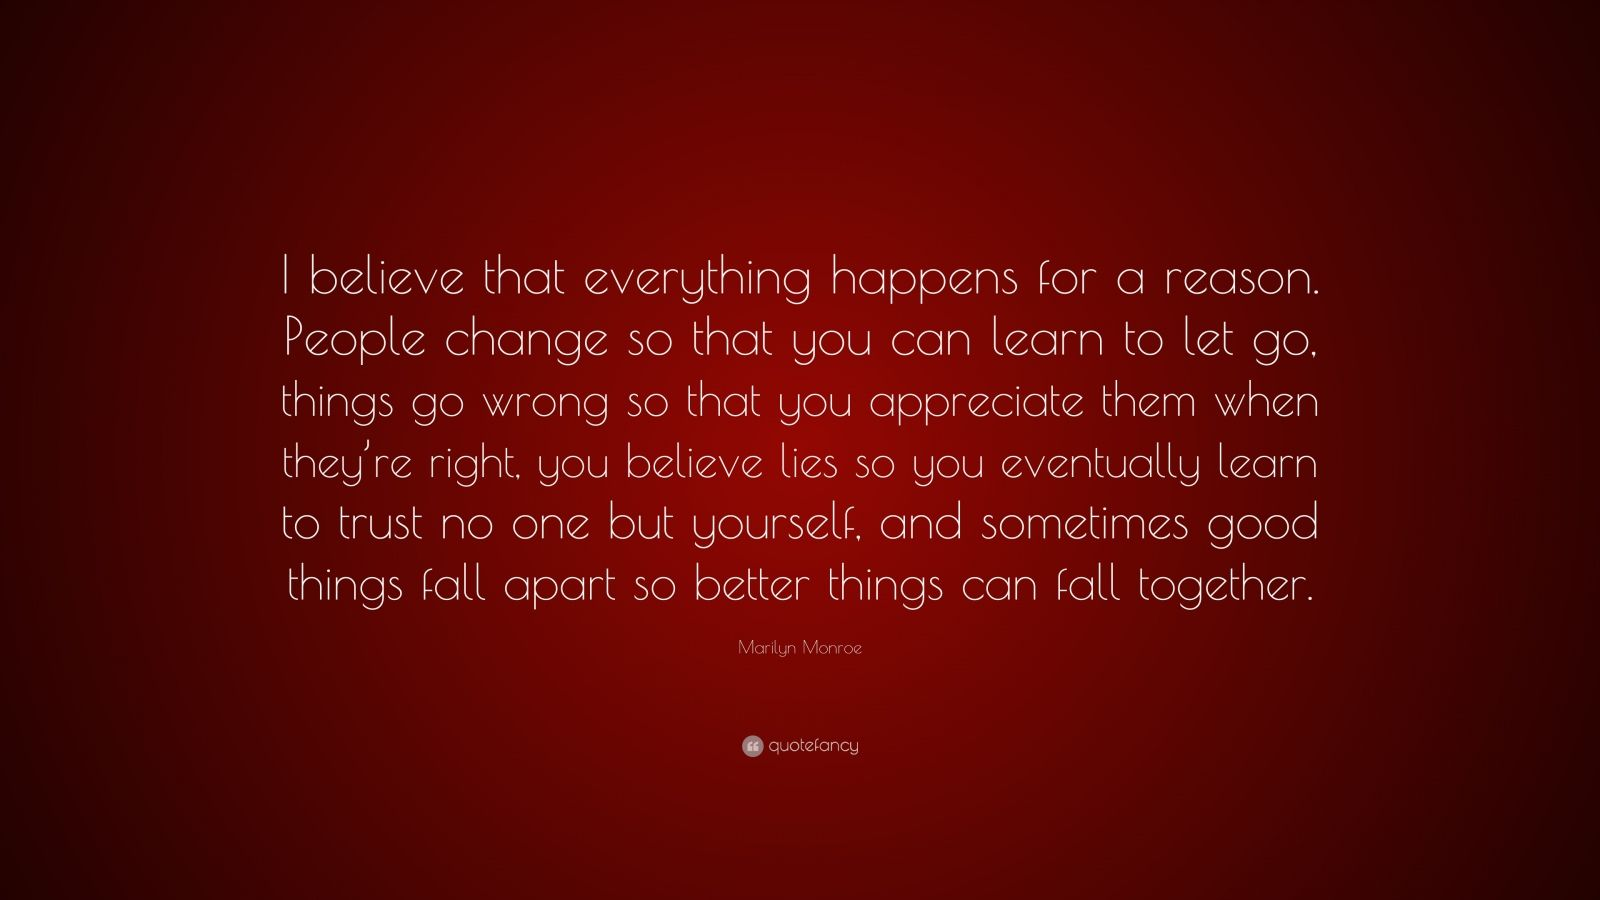 I Believe Everything Happens Reason Marilyn Monroe